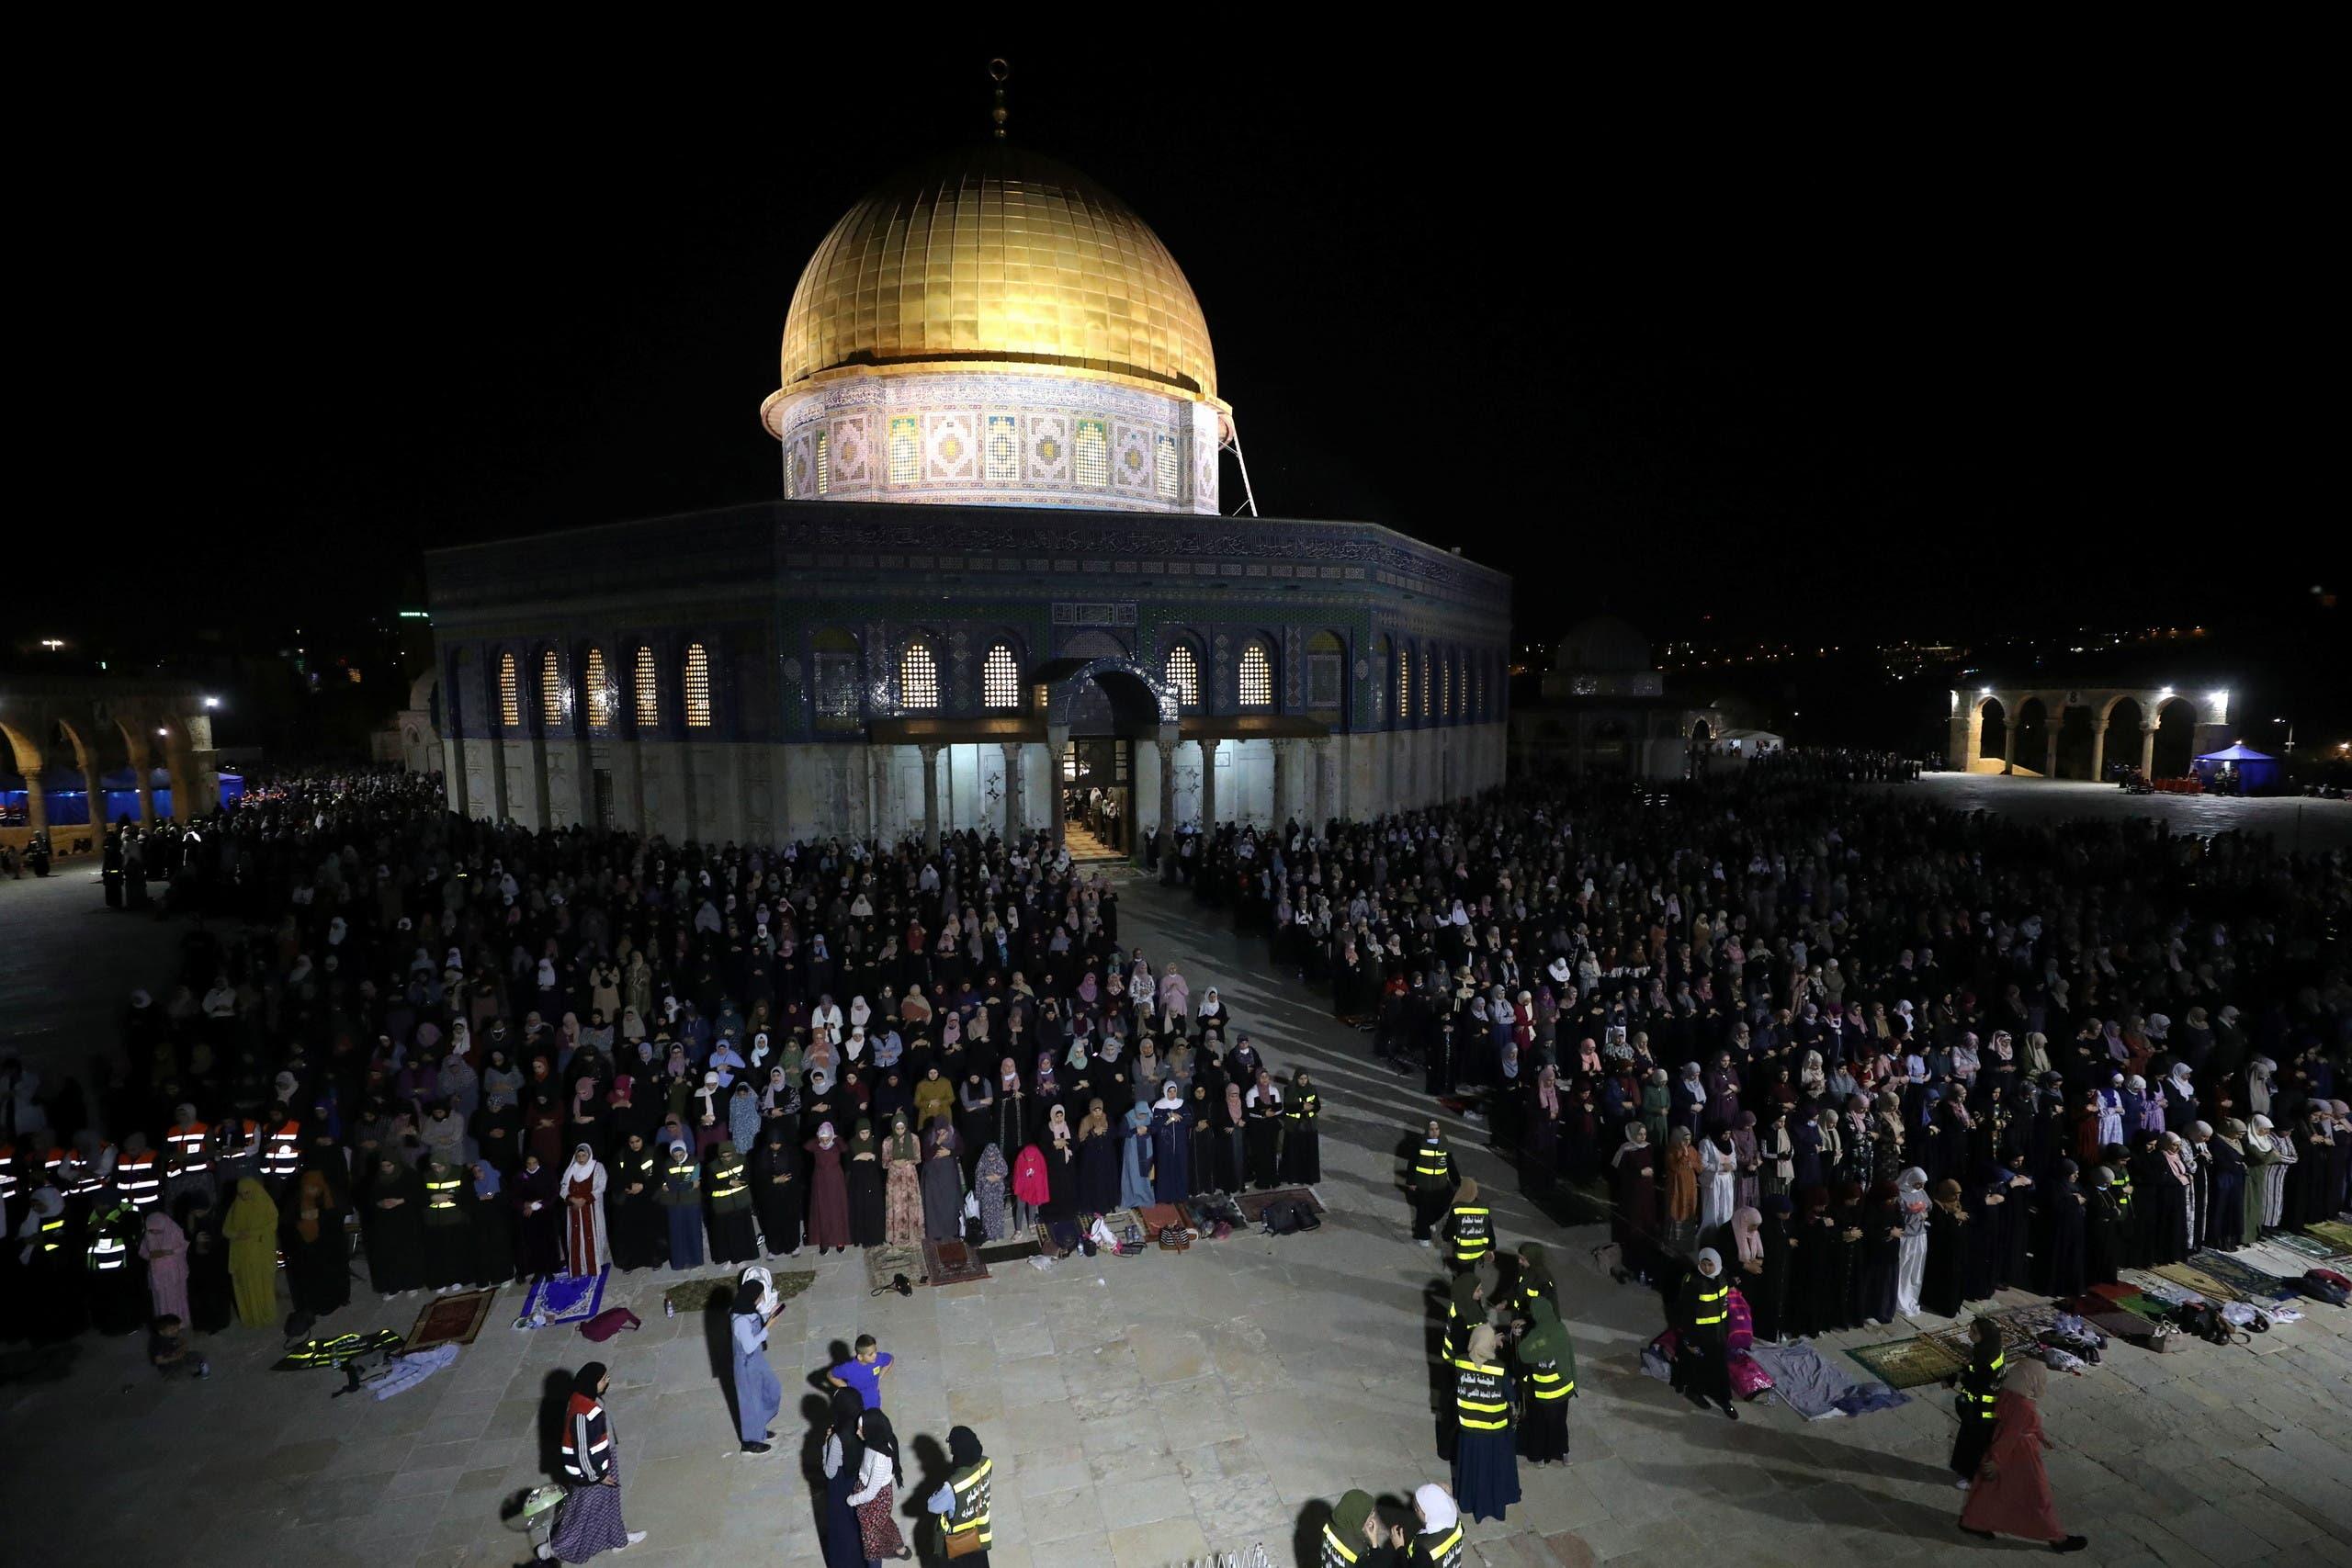 2021-05-08T211401Z_340120979_RC2XBN9S61I6_RTRMADP_3_ISRAEL-PALESTINIANS-JERUSALEM